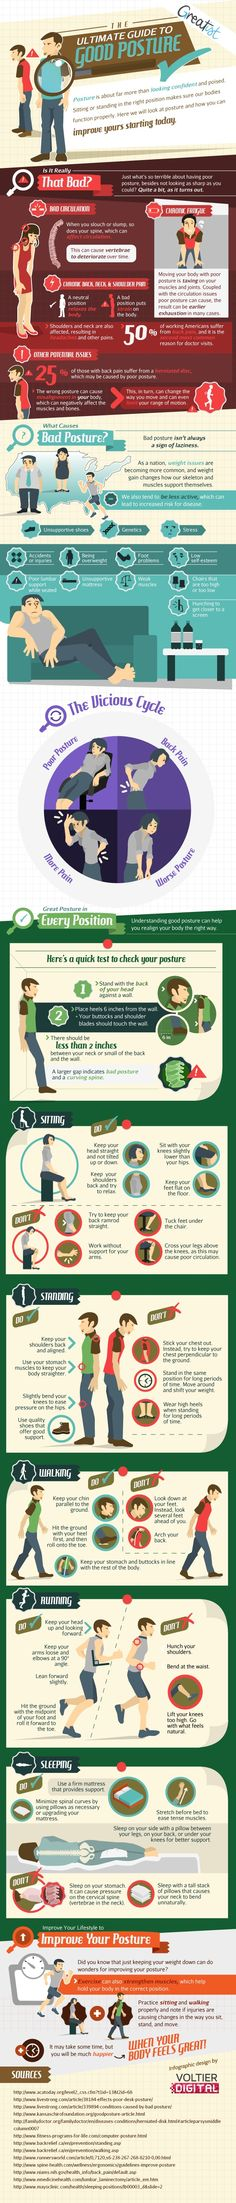 Guía para adoptar siempre la mejor postura #infografia #infographic #health